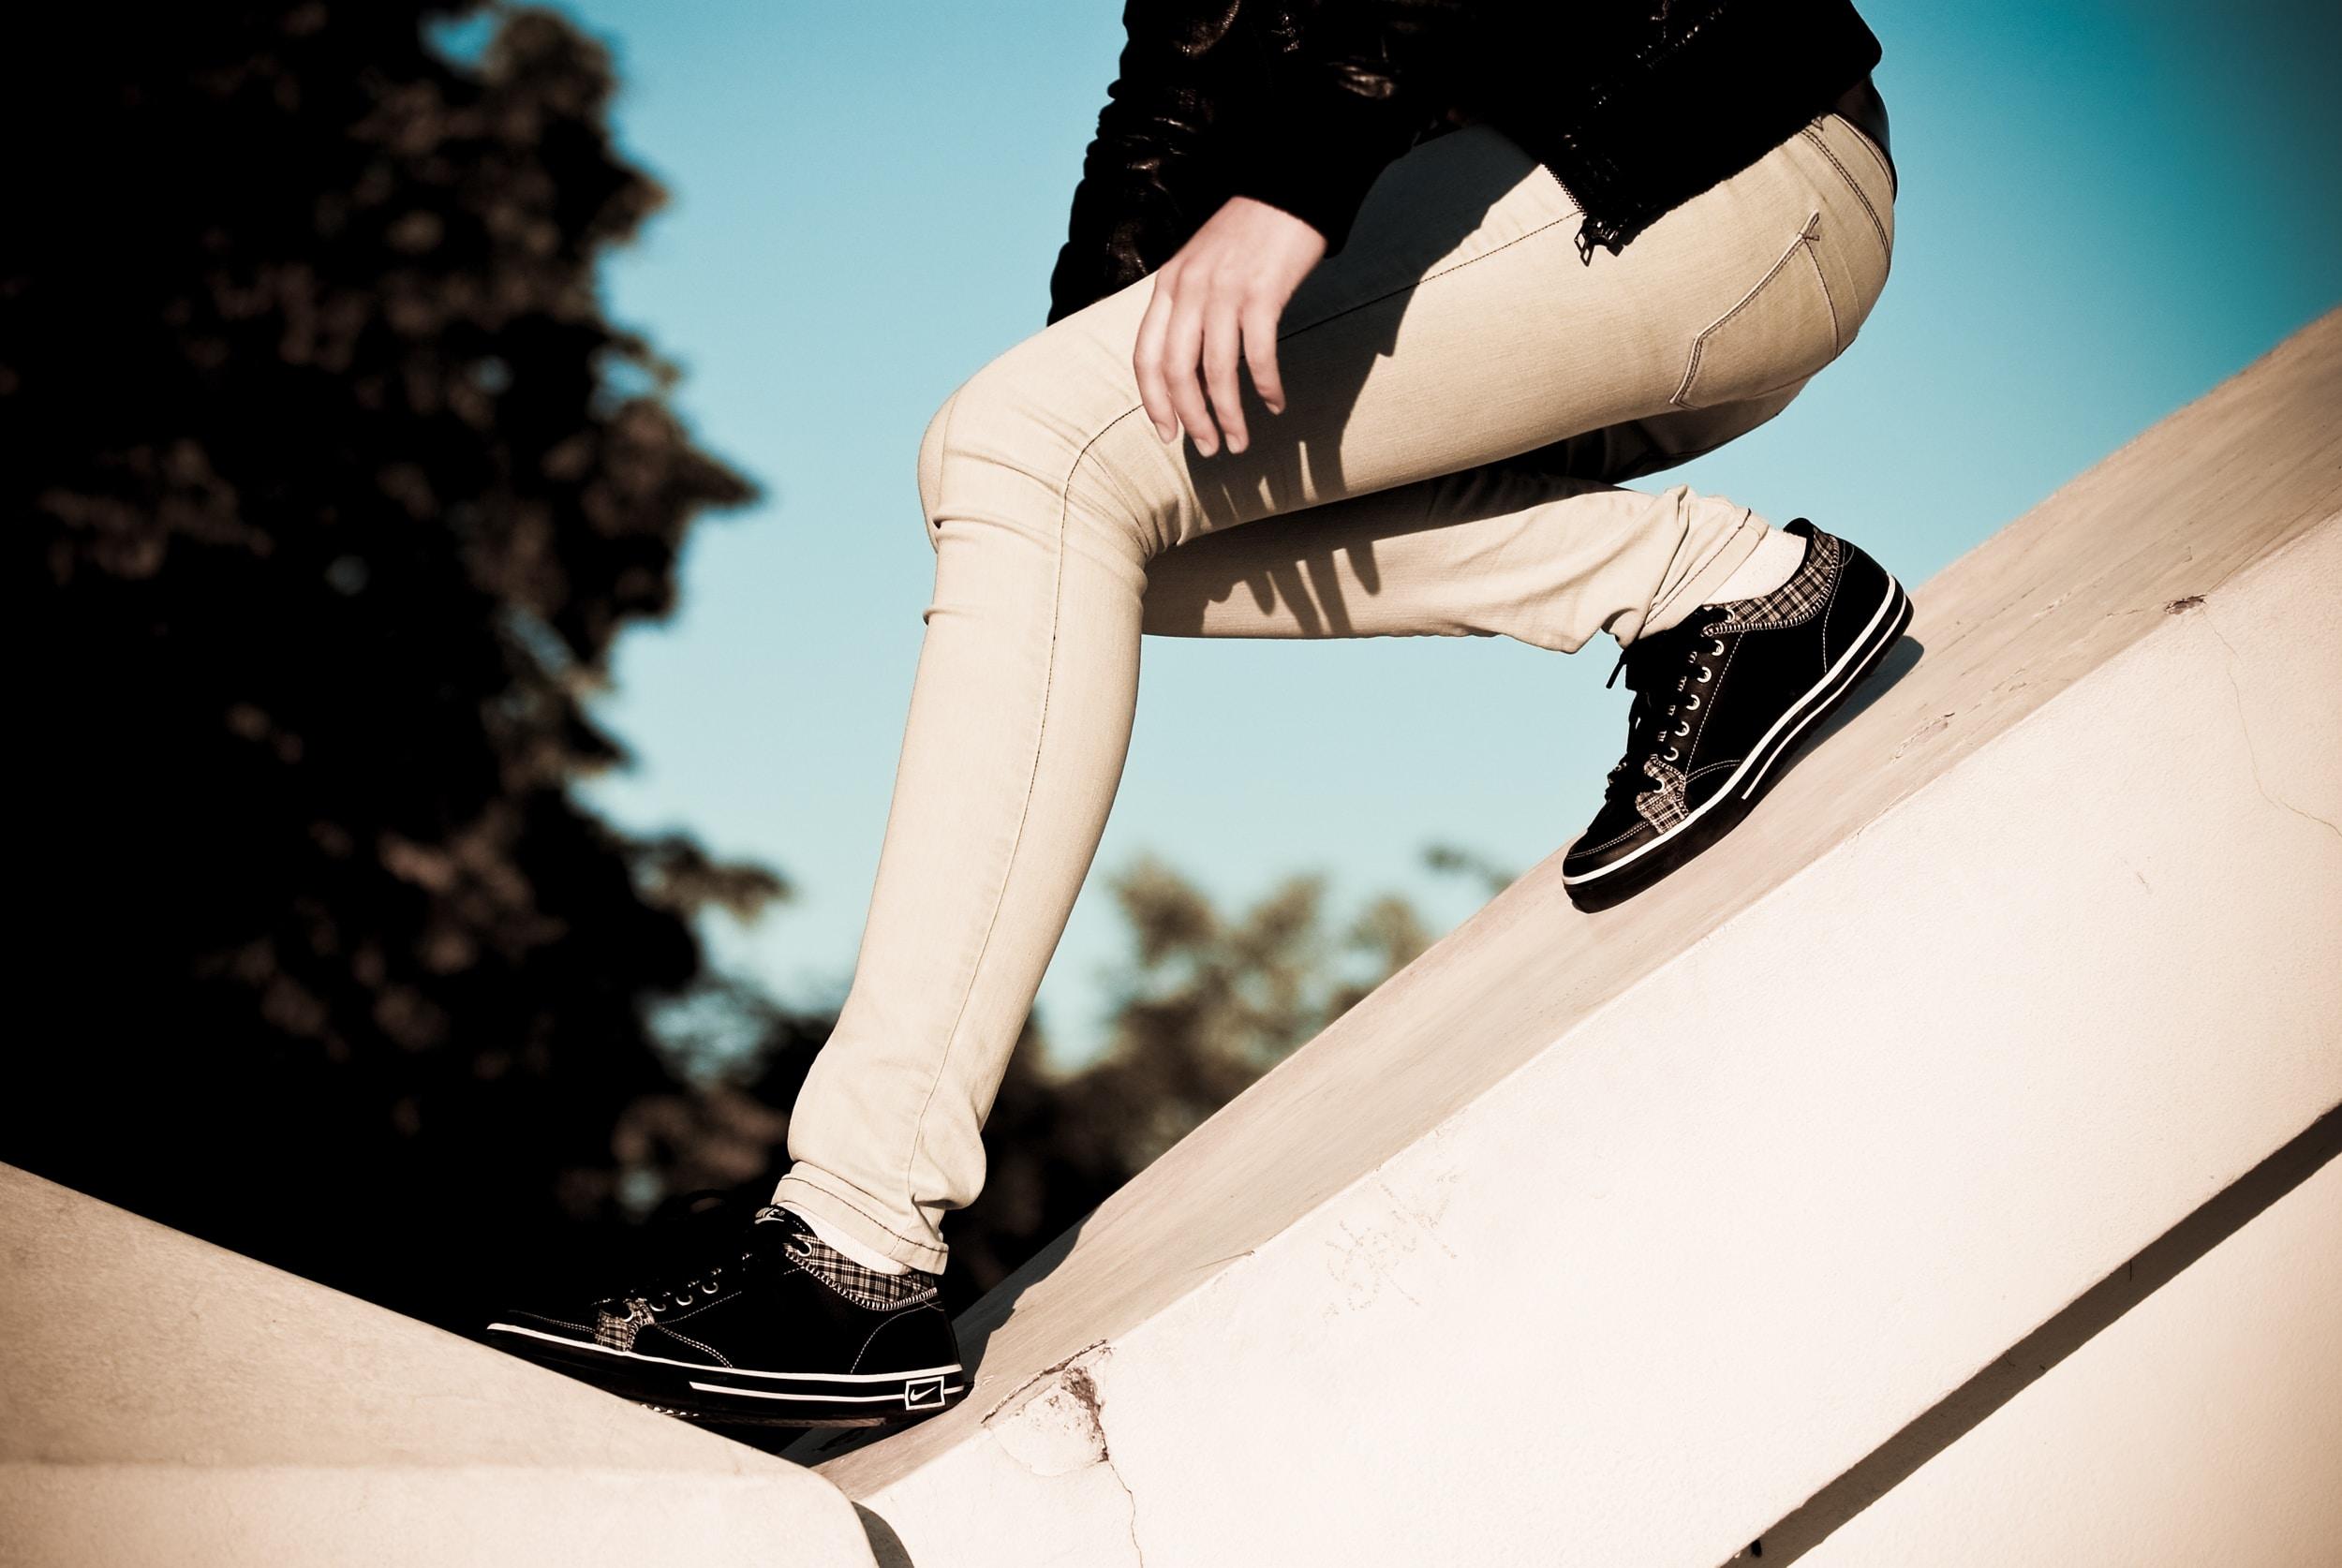 person wearing beige pants sliding on slope